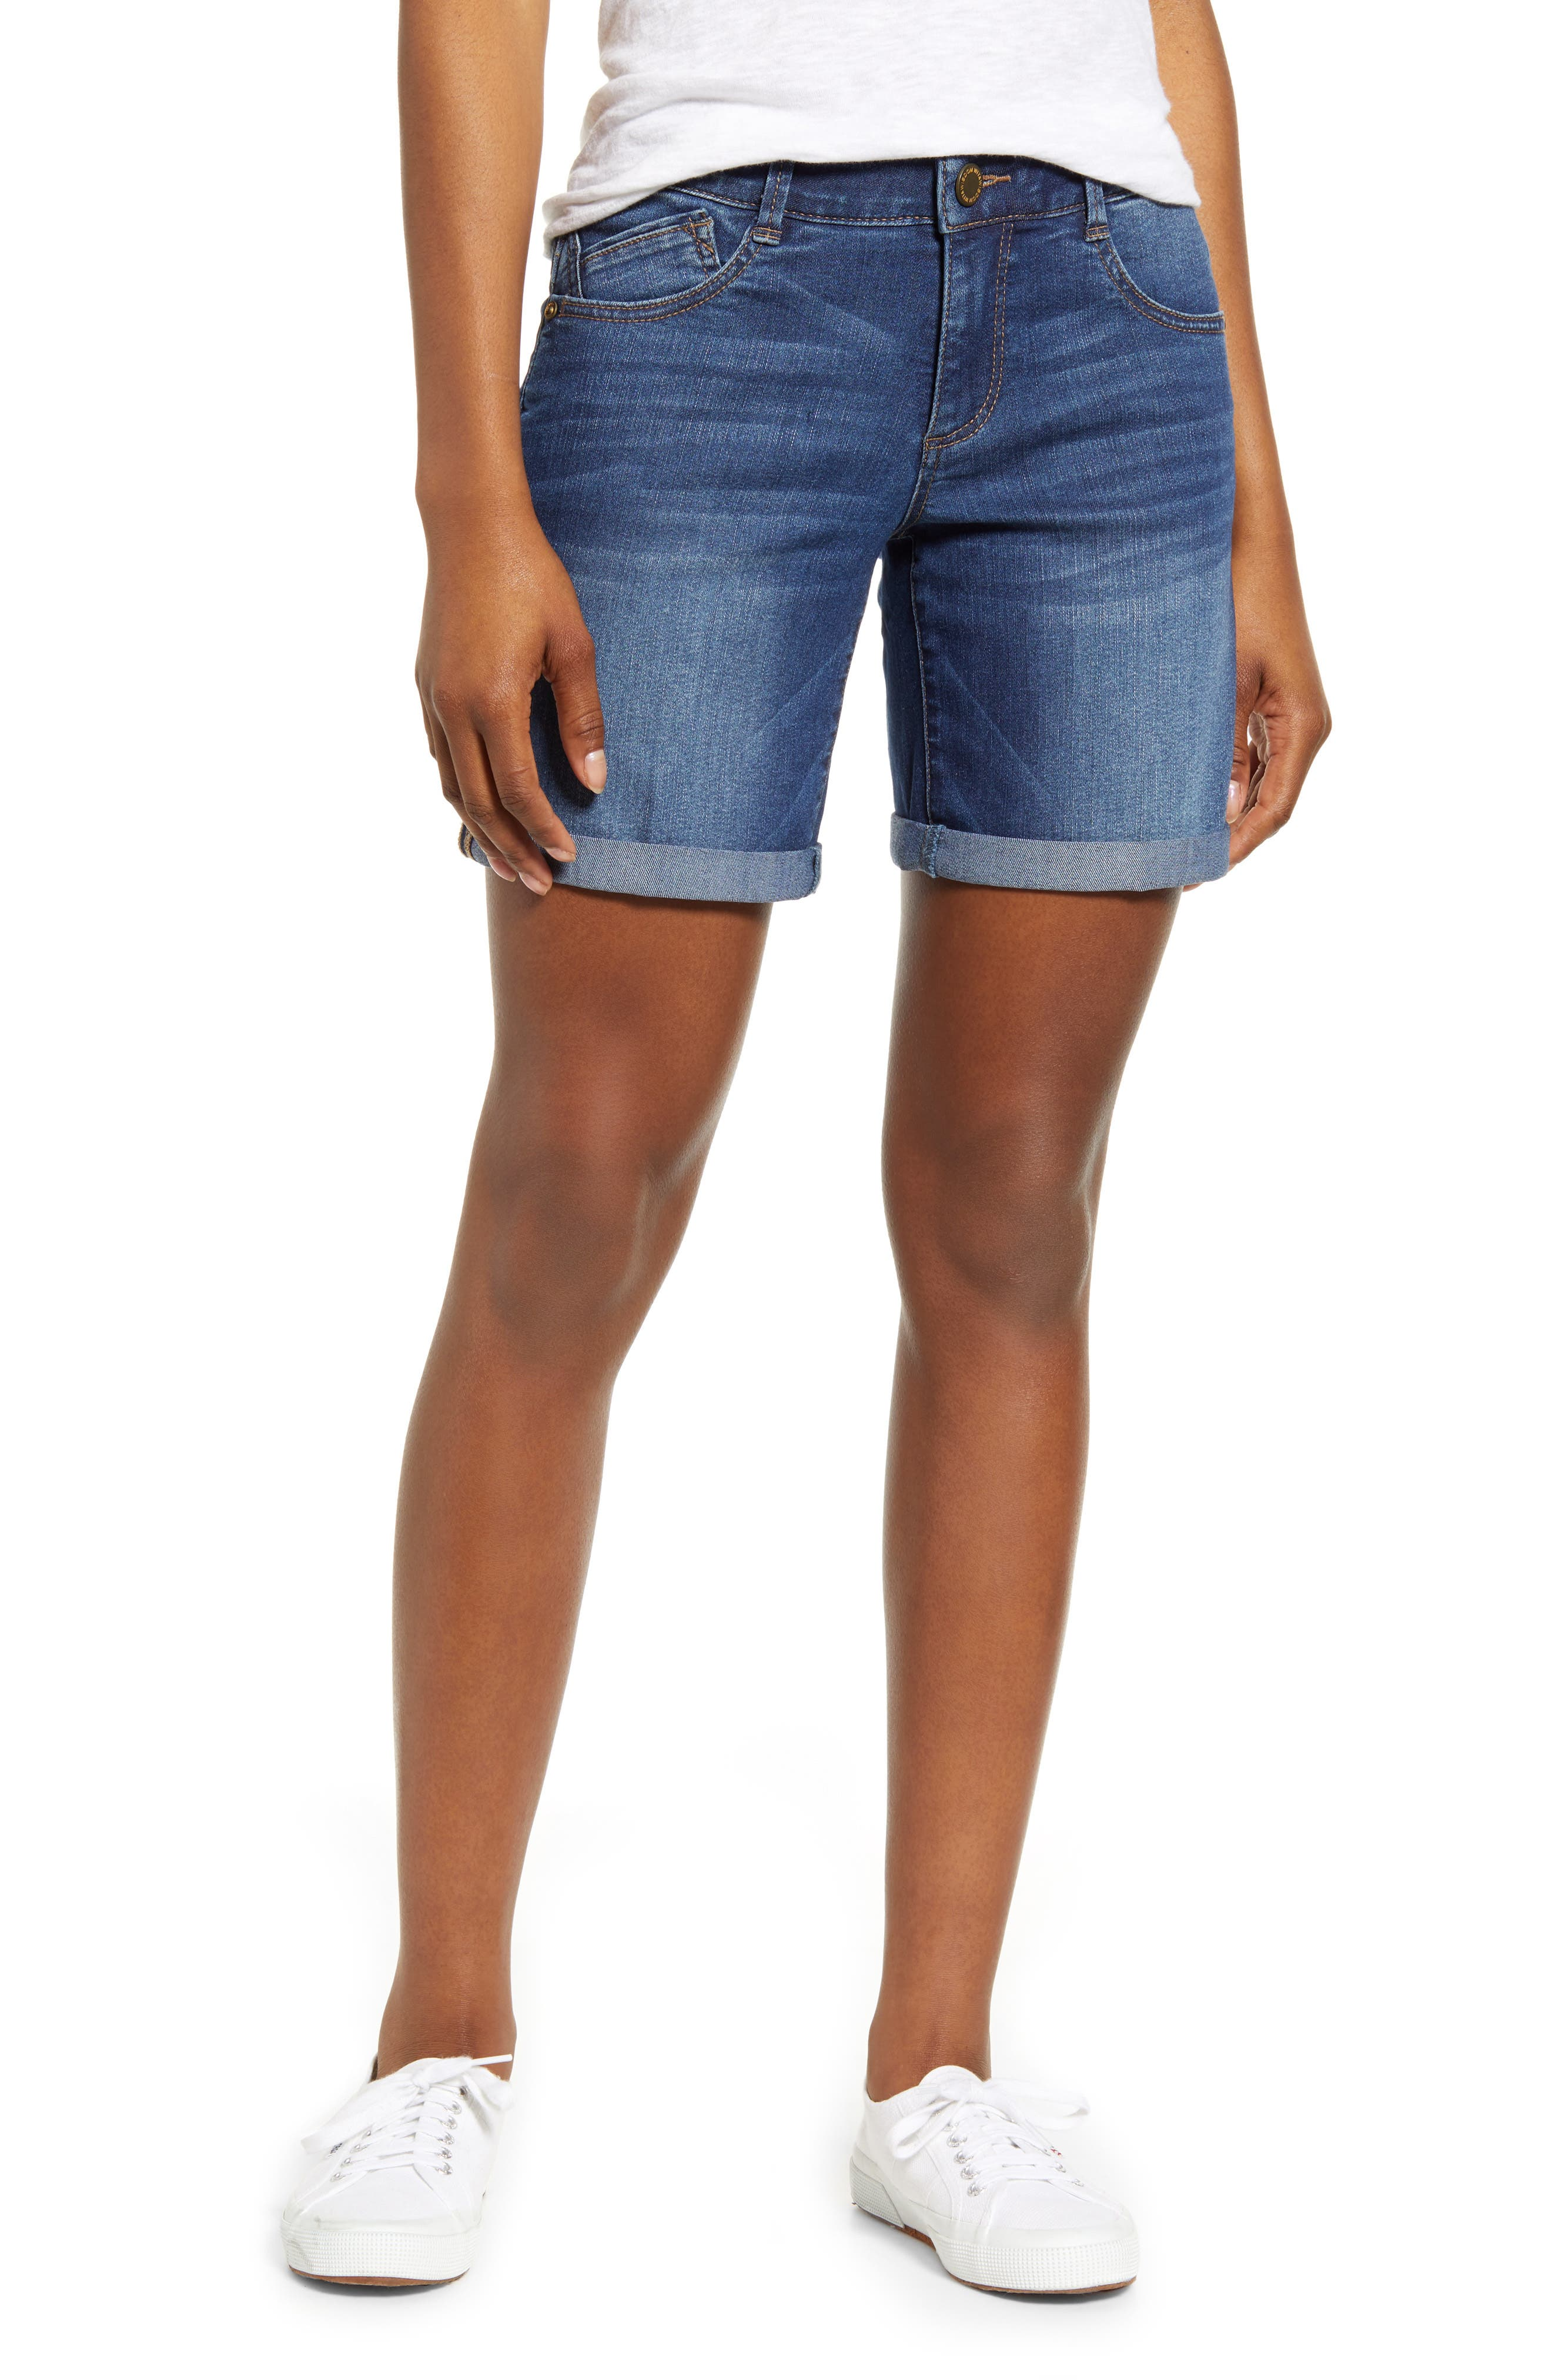 Women's Wit & Wisdom Ab-Solution Cuffed Denim Shorts